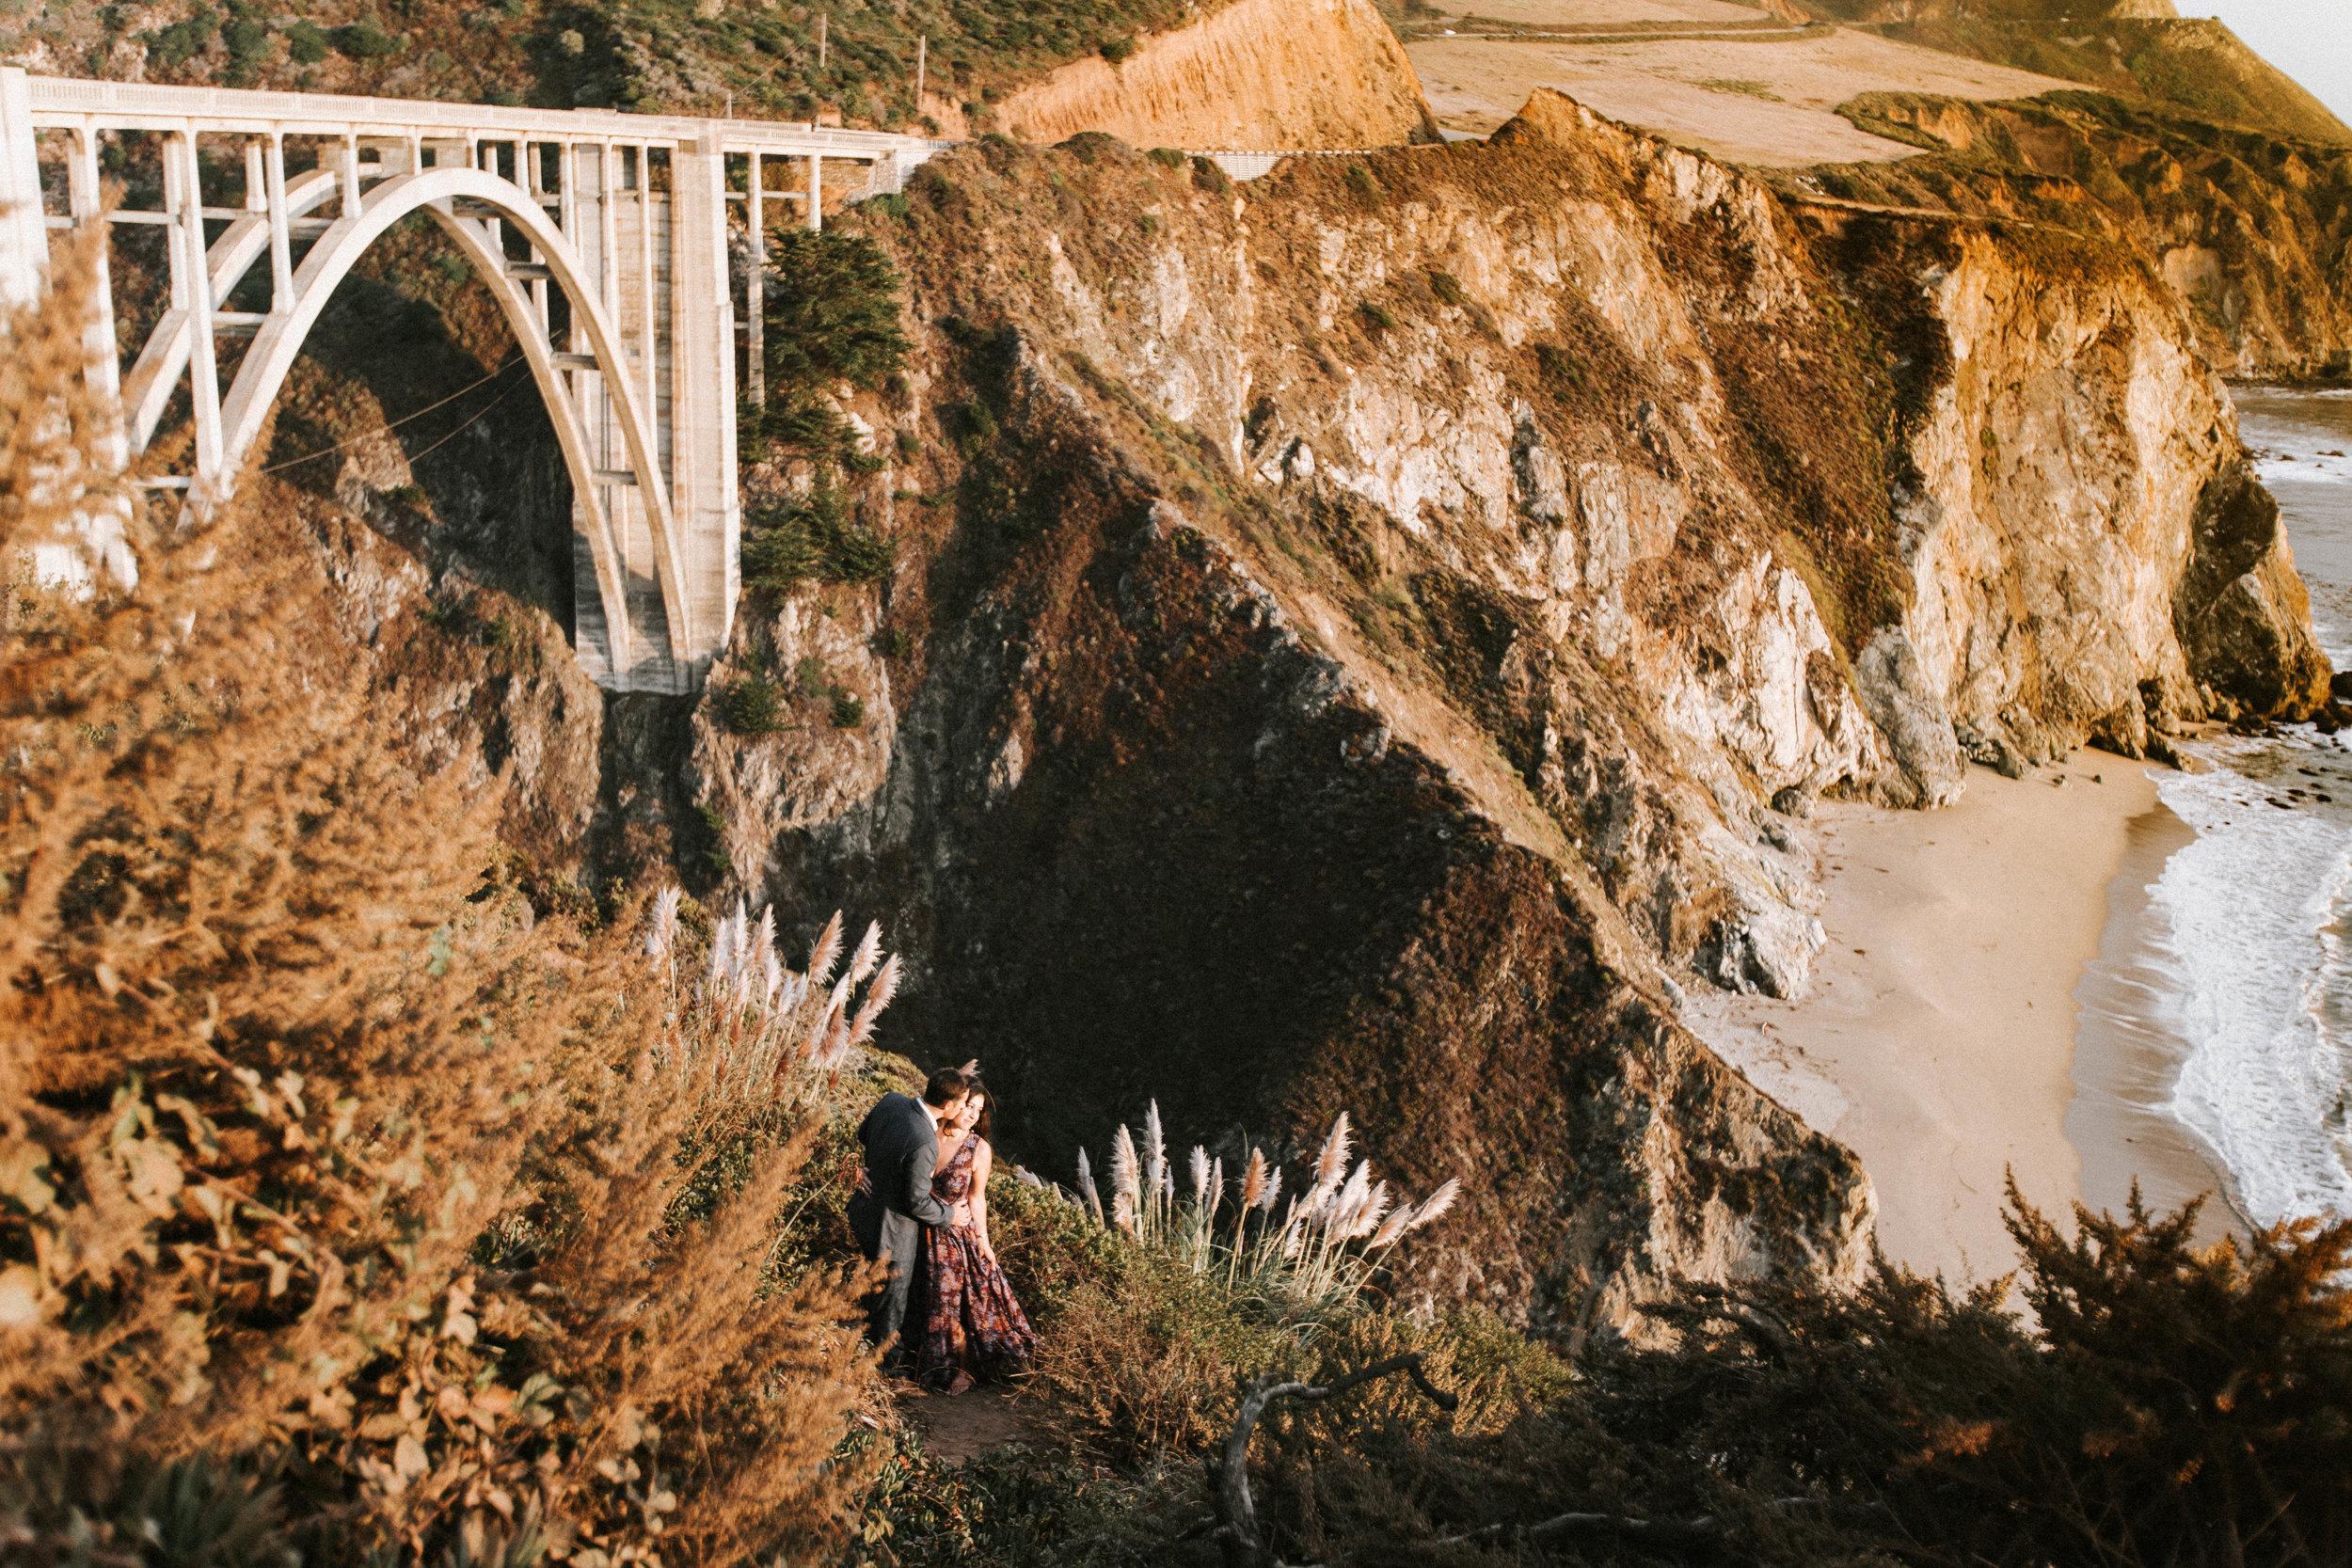 nicole-daacke-photography-big-sur-california-coast-adventure-engagement-photos-adventurous-elopement-intimate-wedding-photographer-golden-coastal-cali-engagement-session-21.jpg